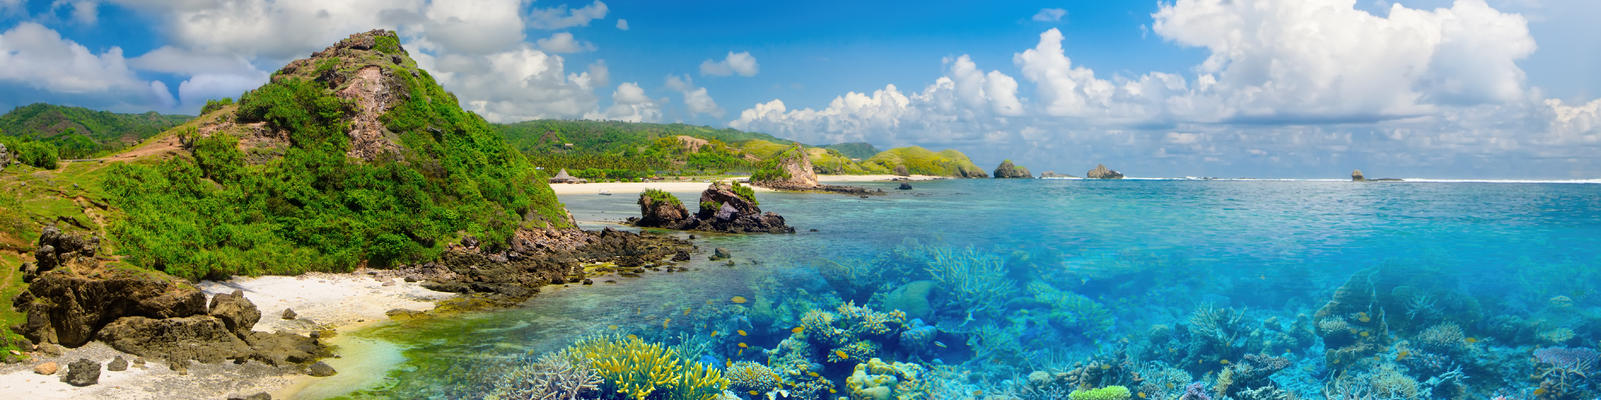 Lombok (Photo:soft_light/Shutterstock)